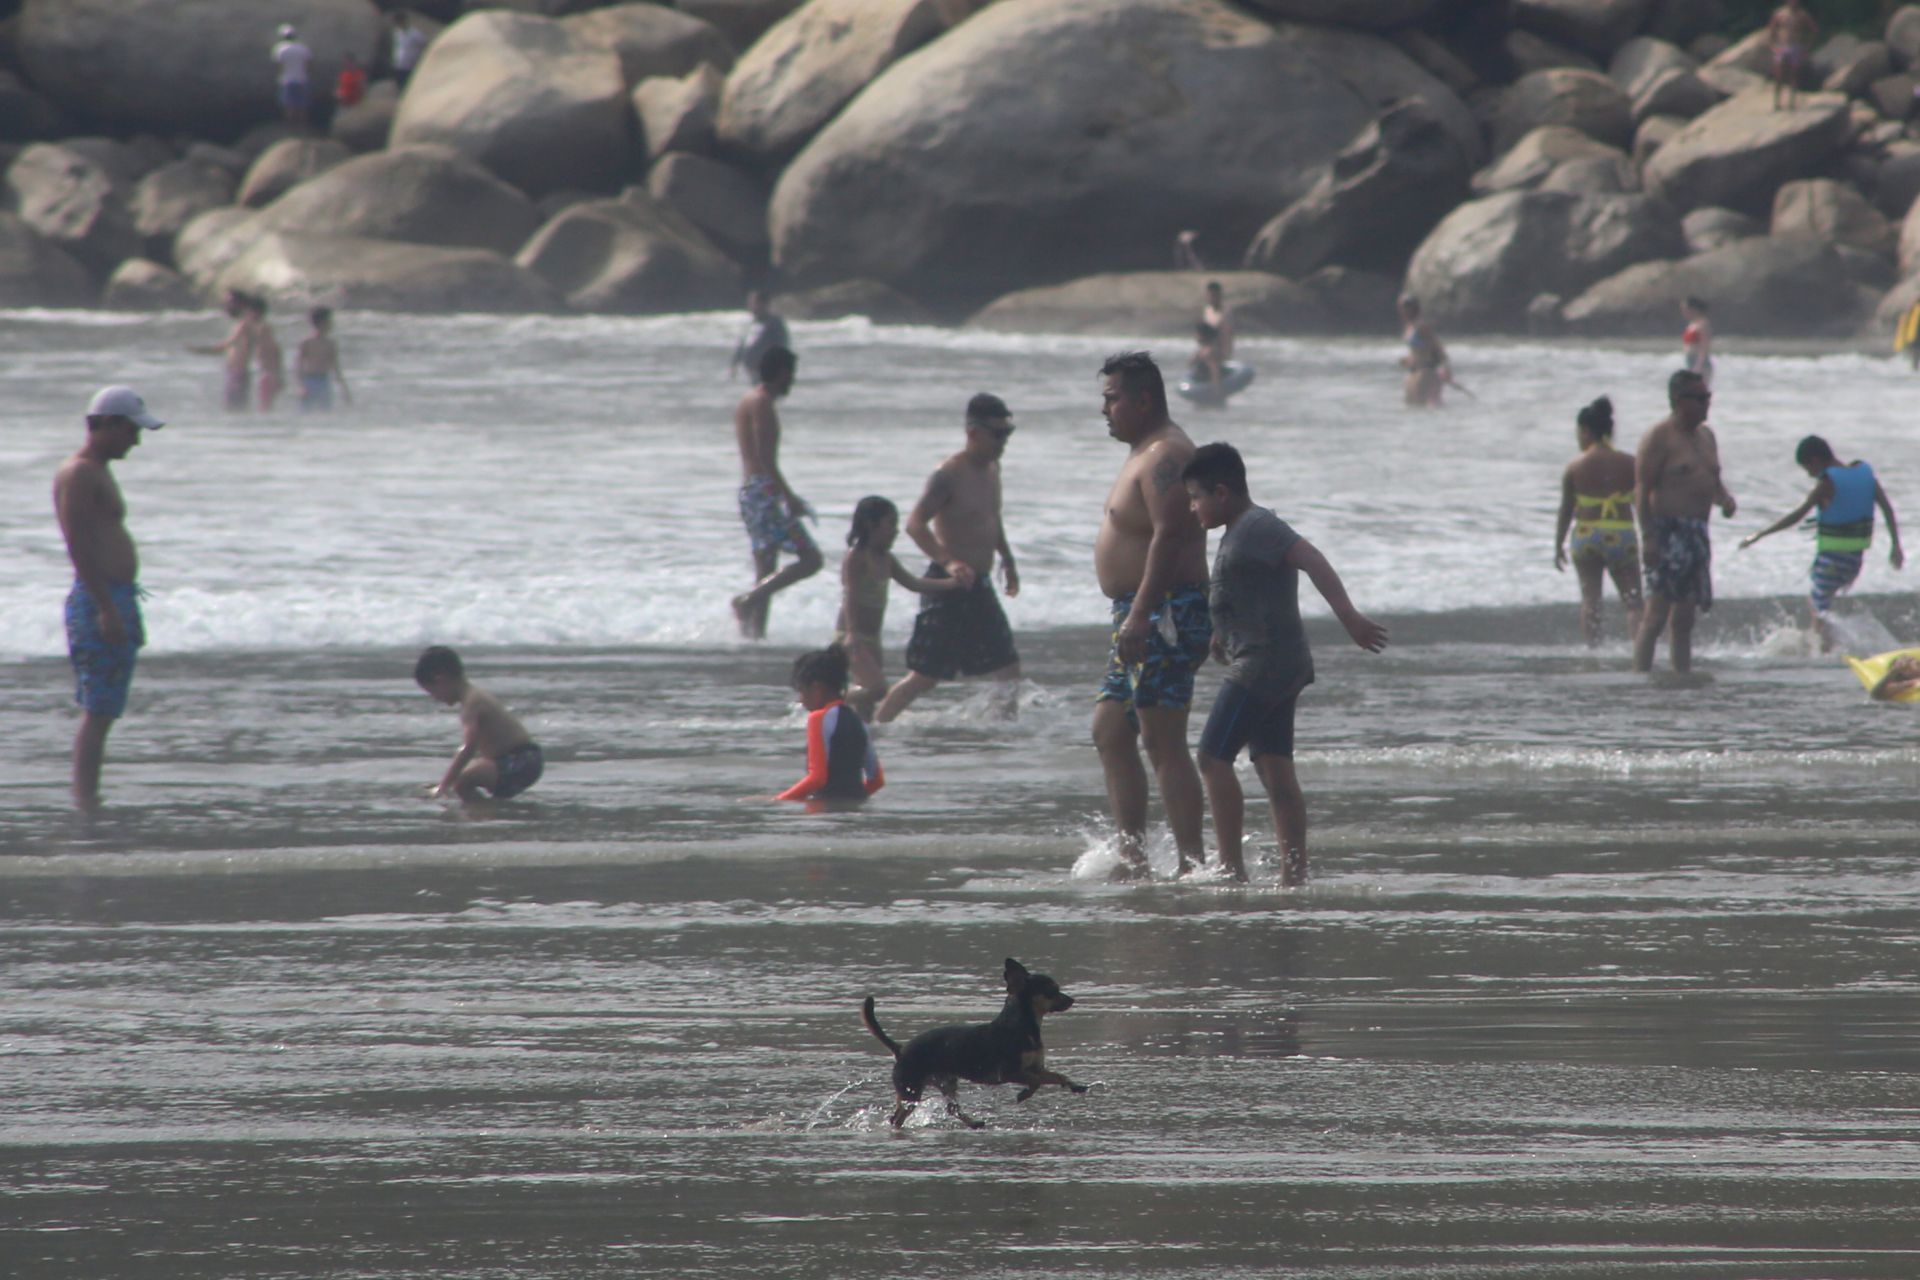 Acapulco, Guerrero, 25 de diciembre de 2020.